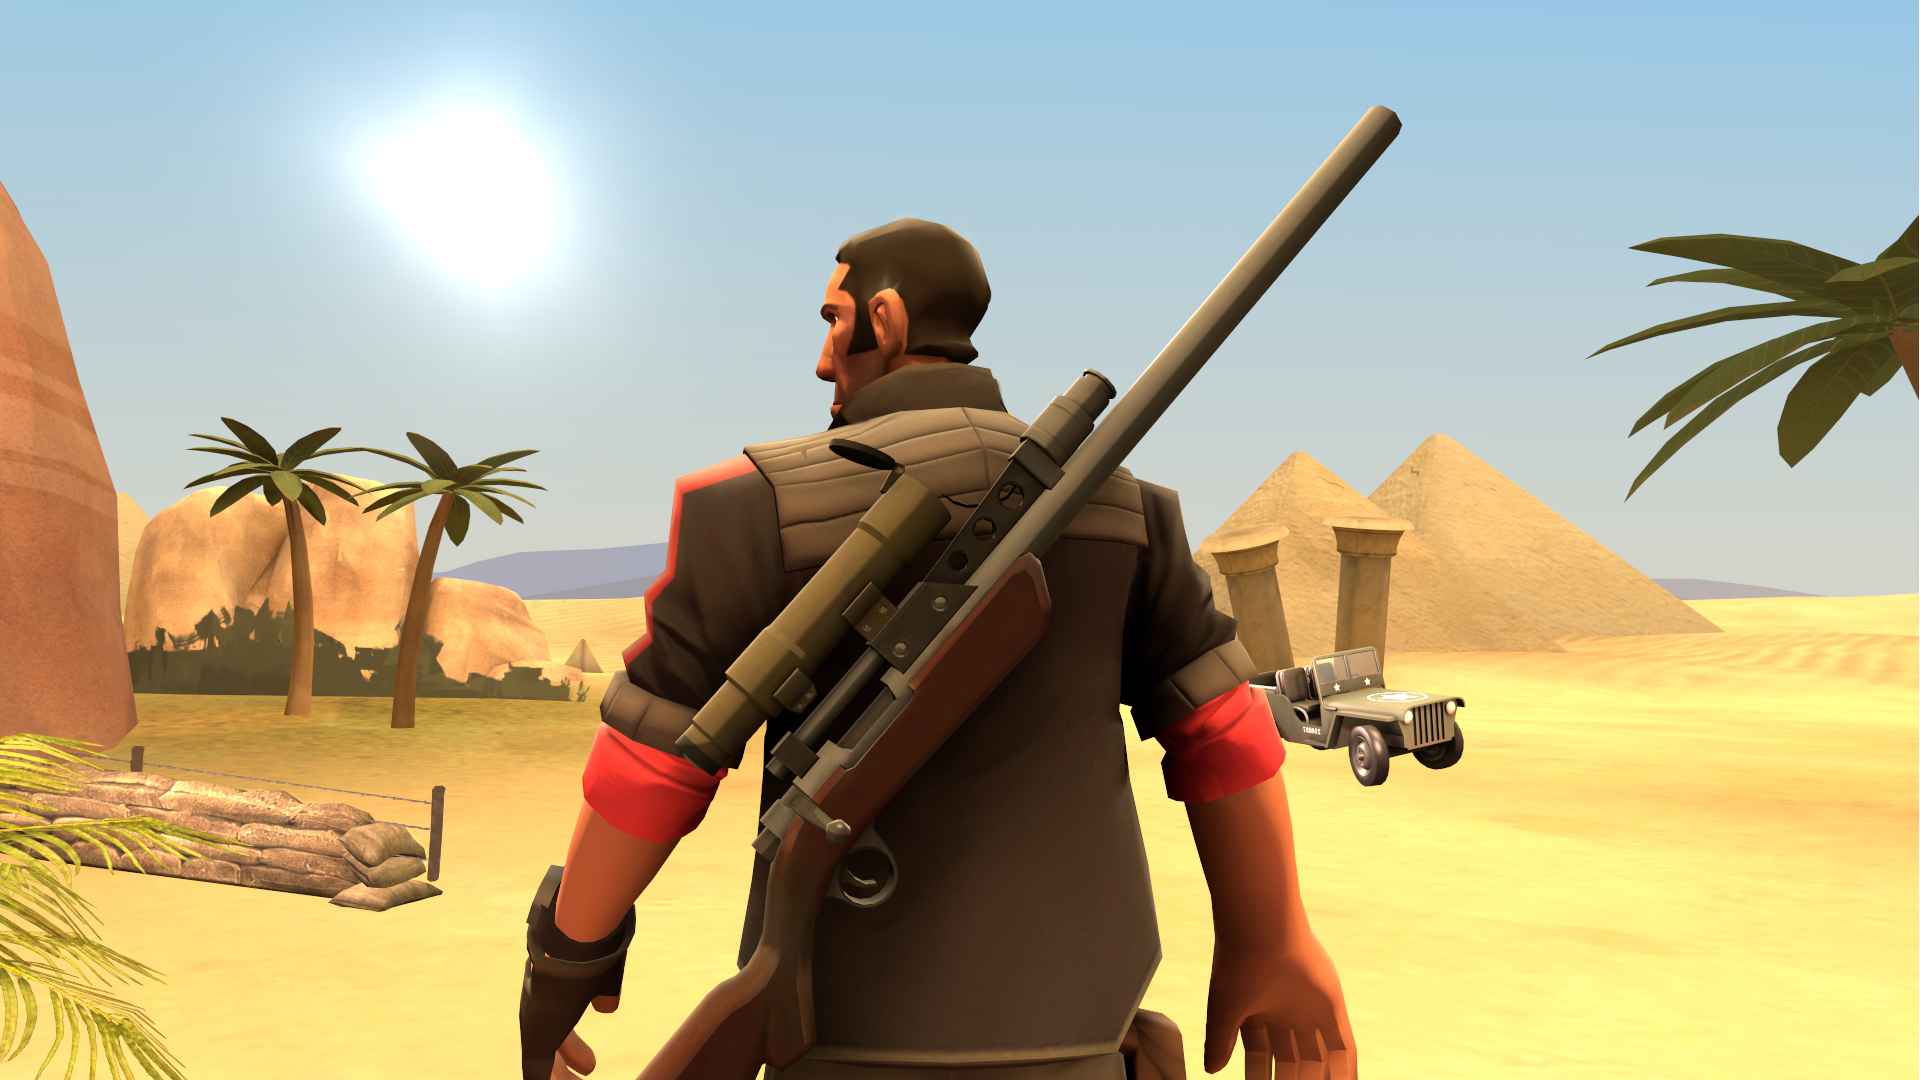 Sniper Elite 3 Wallpaper: Sniper Elite 3 By Matadorro On DeviantArt